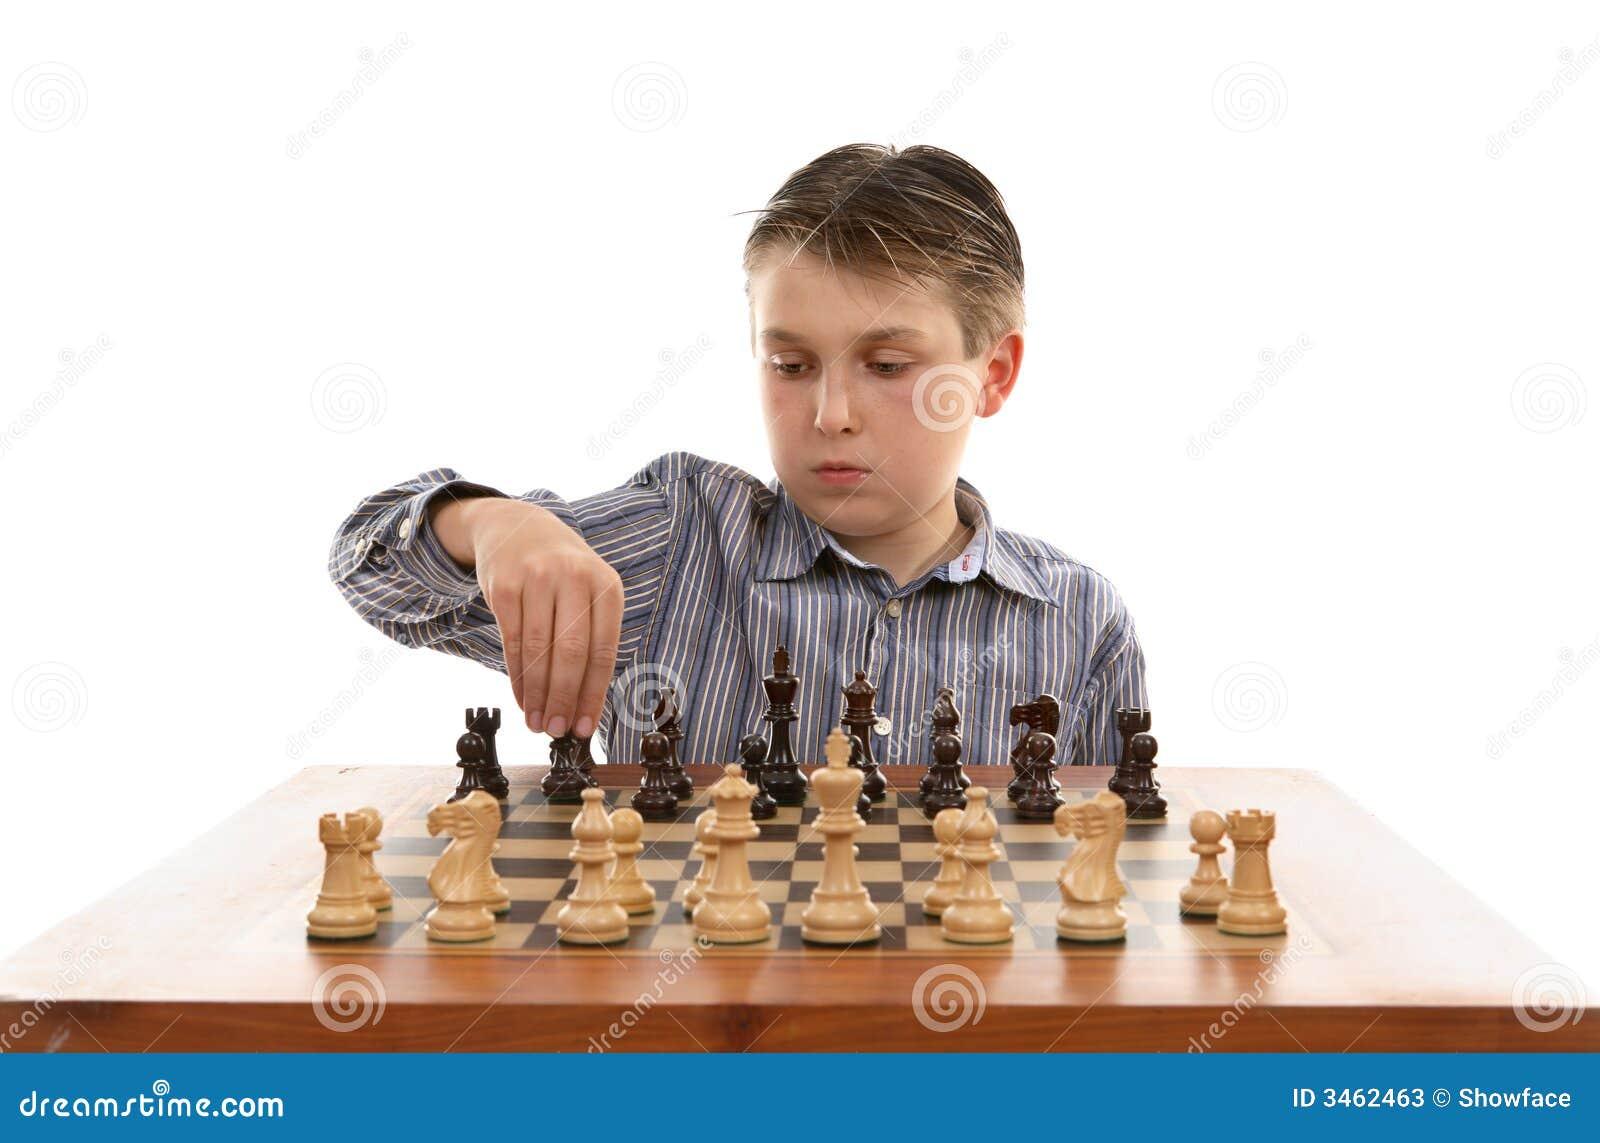 Chessmen, The - The Fightin'